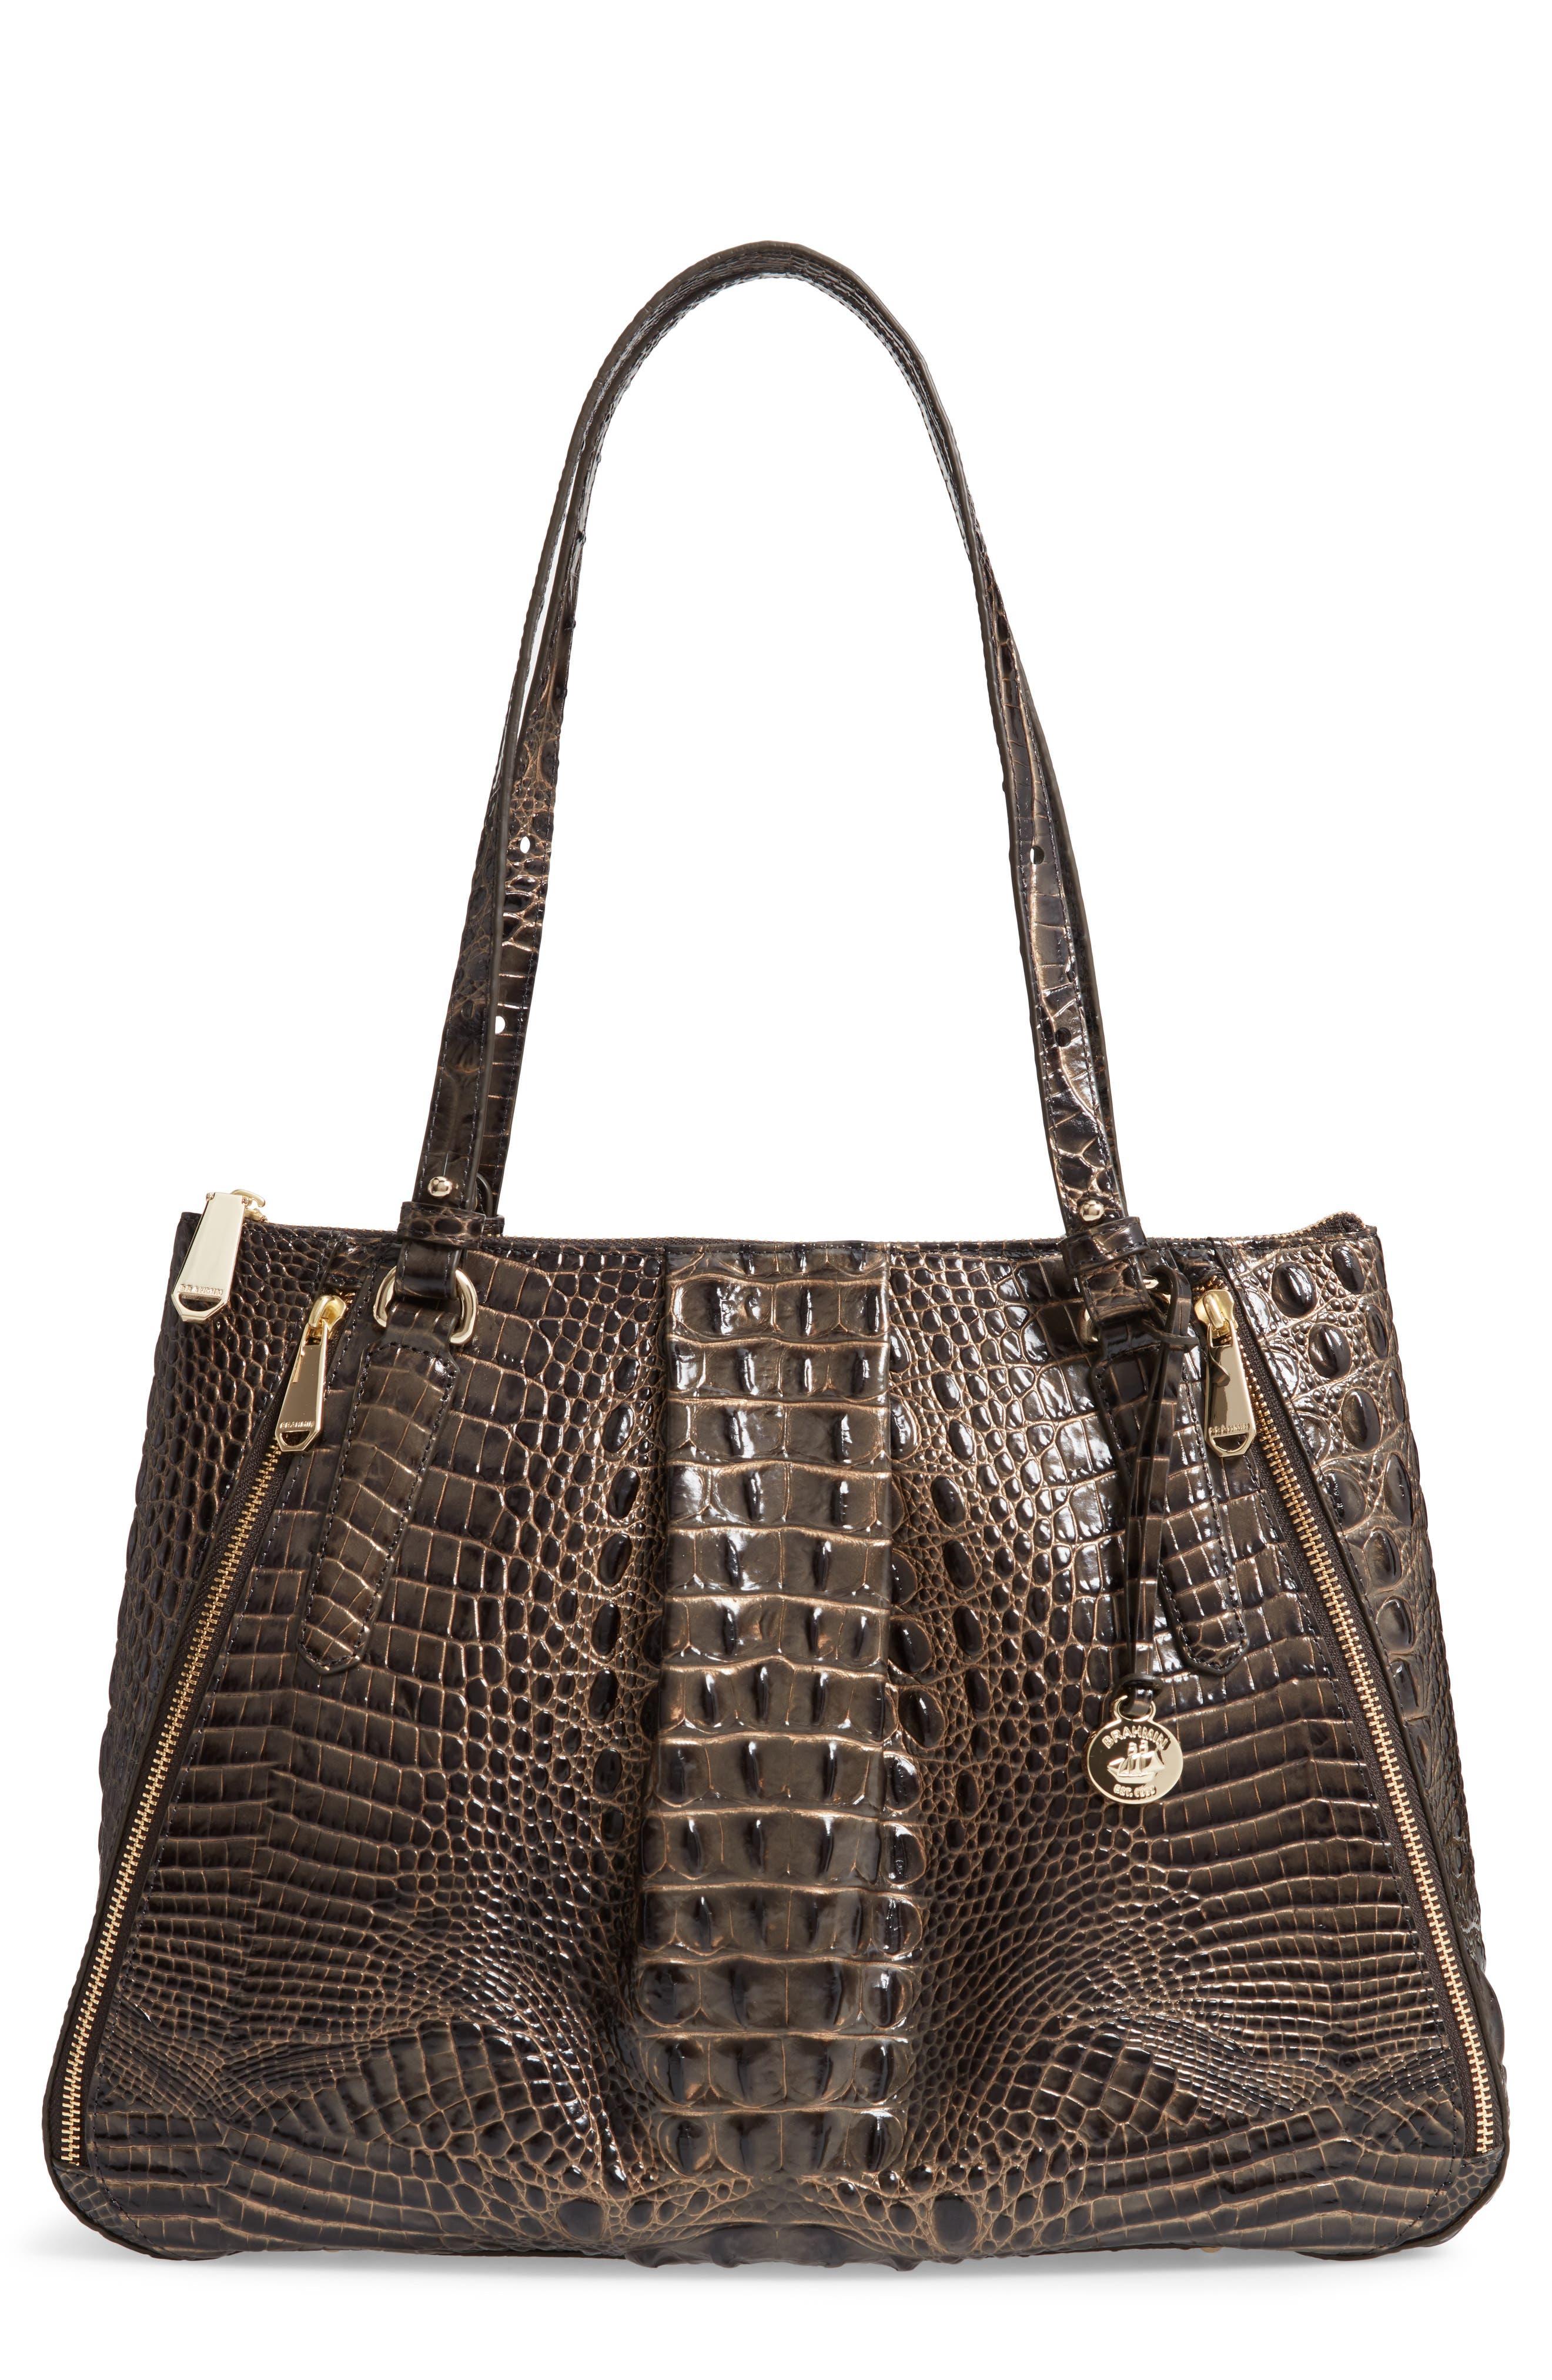 Melbourne - Adina Croc Embossed Leather Satchel,                             Main thumbnail 1, color,                             GRAPHITE